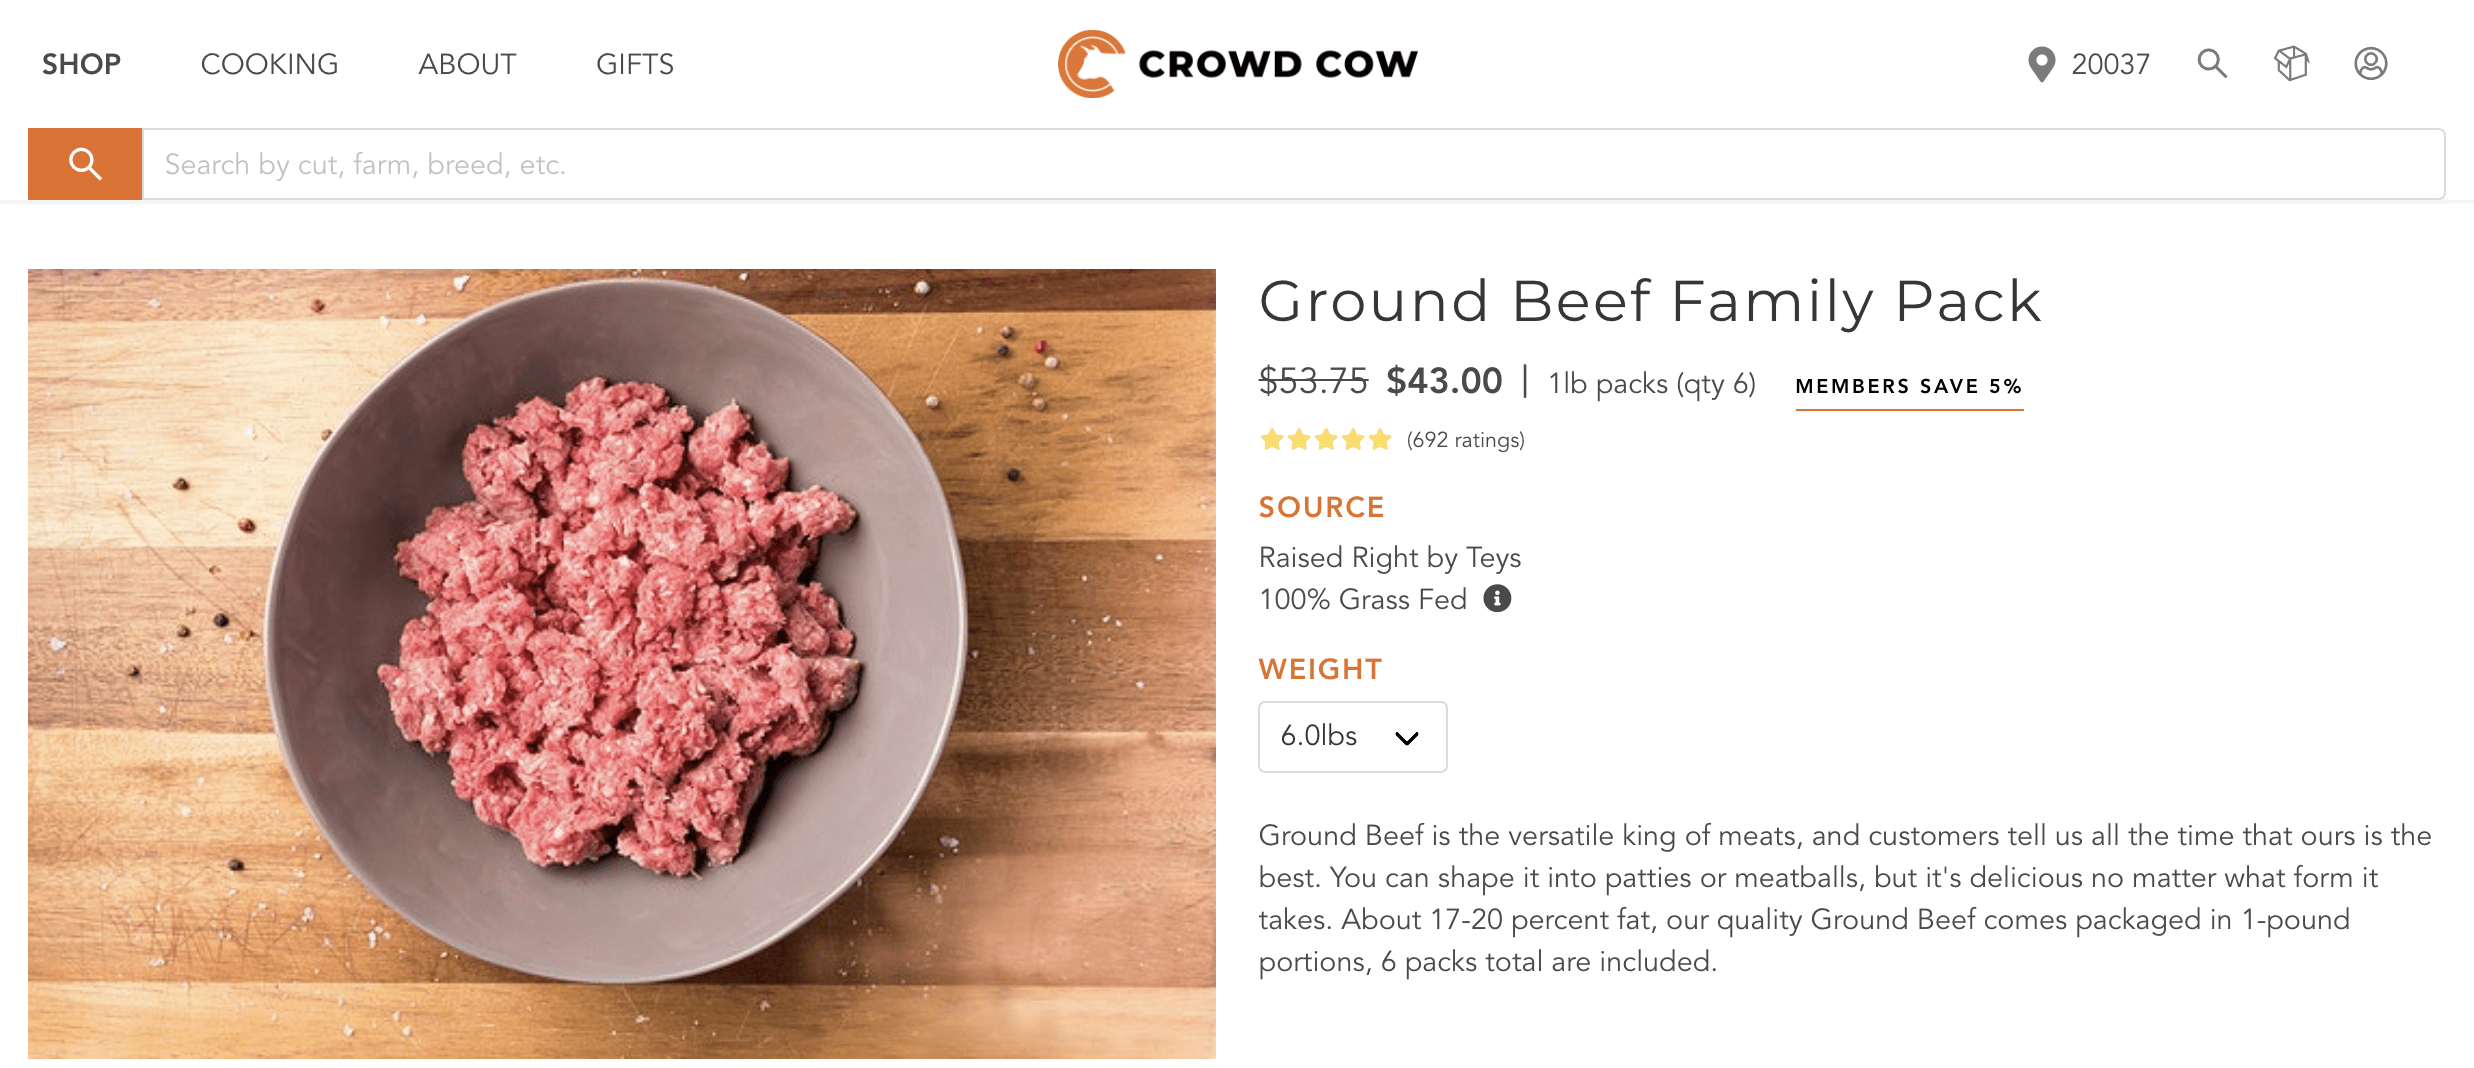 Crowd Cow Ground Beef Bulk Discount via Butcher Special